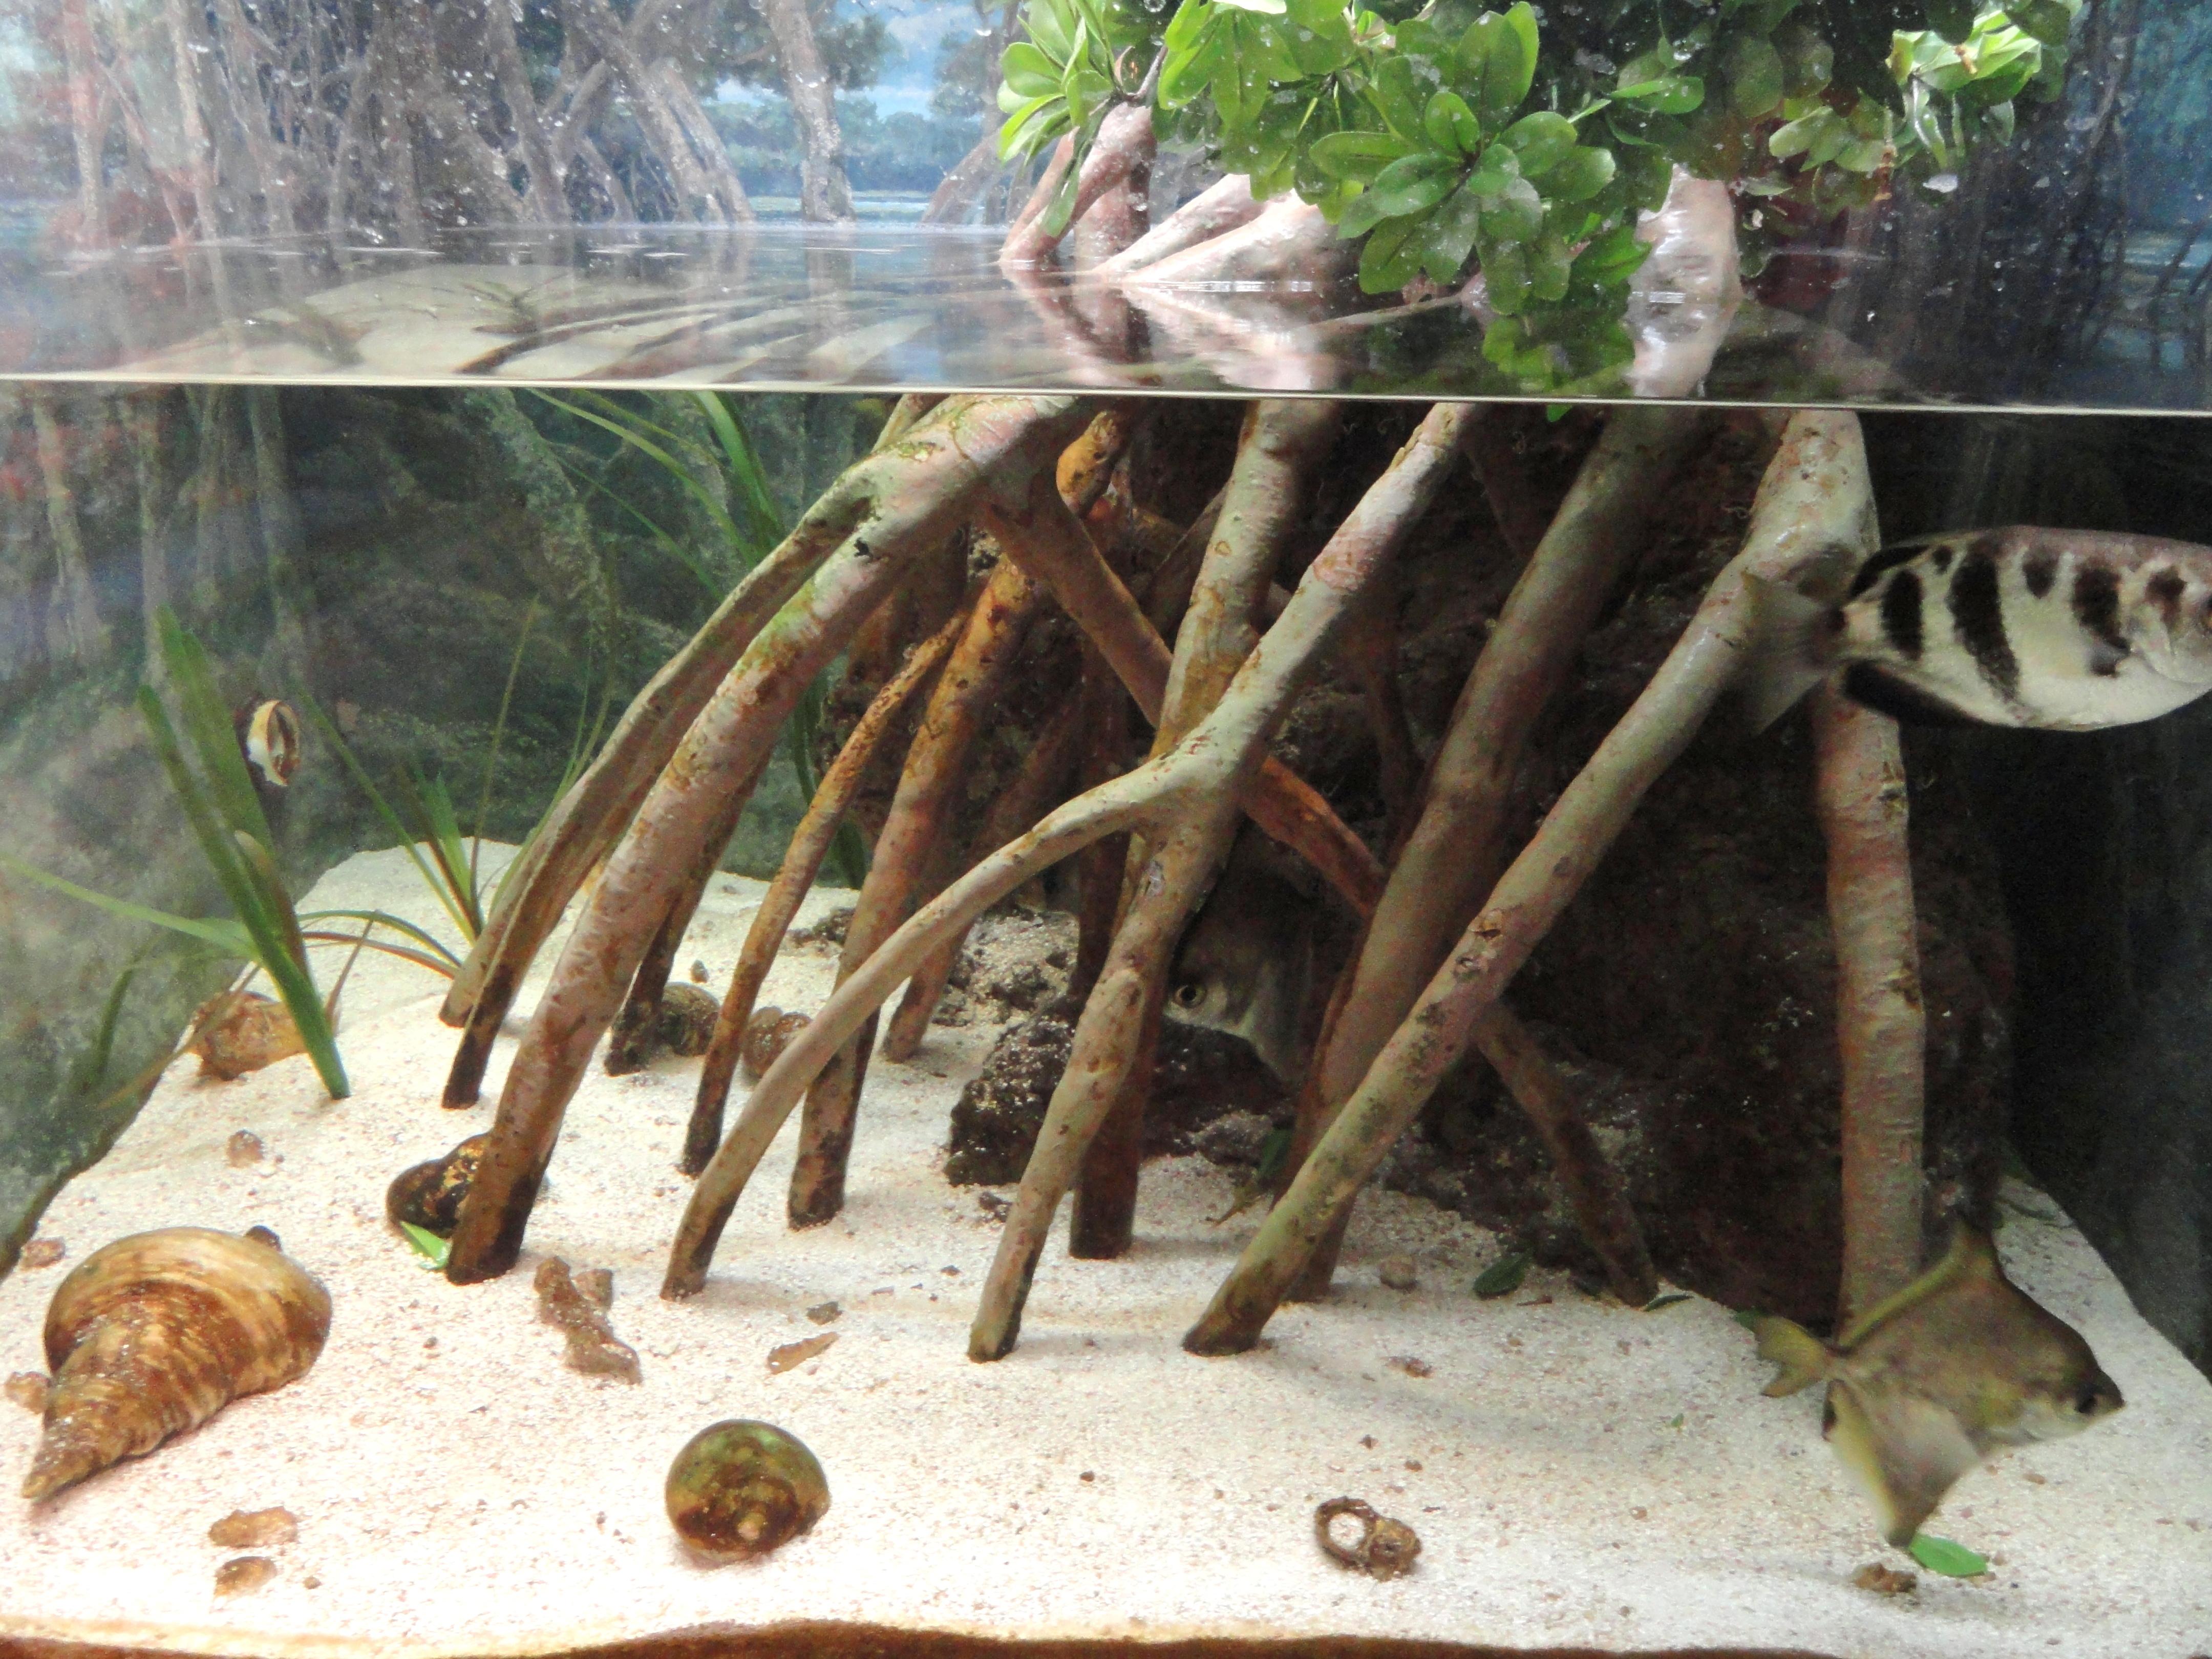 File:Mangrove aquarium - Springfield Science Museum - Springfield, MA - DSC03479.JPG - Wikimedia ...